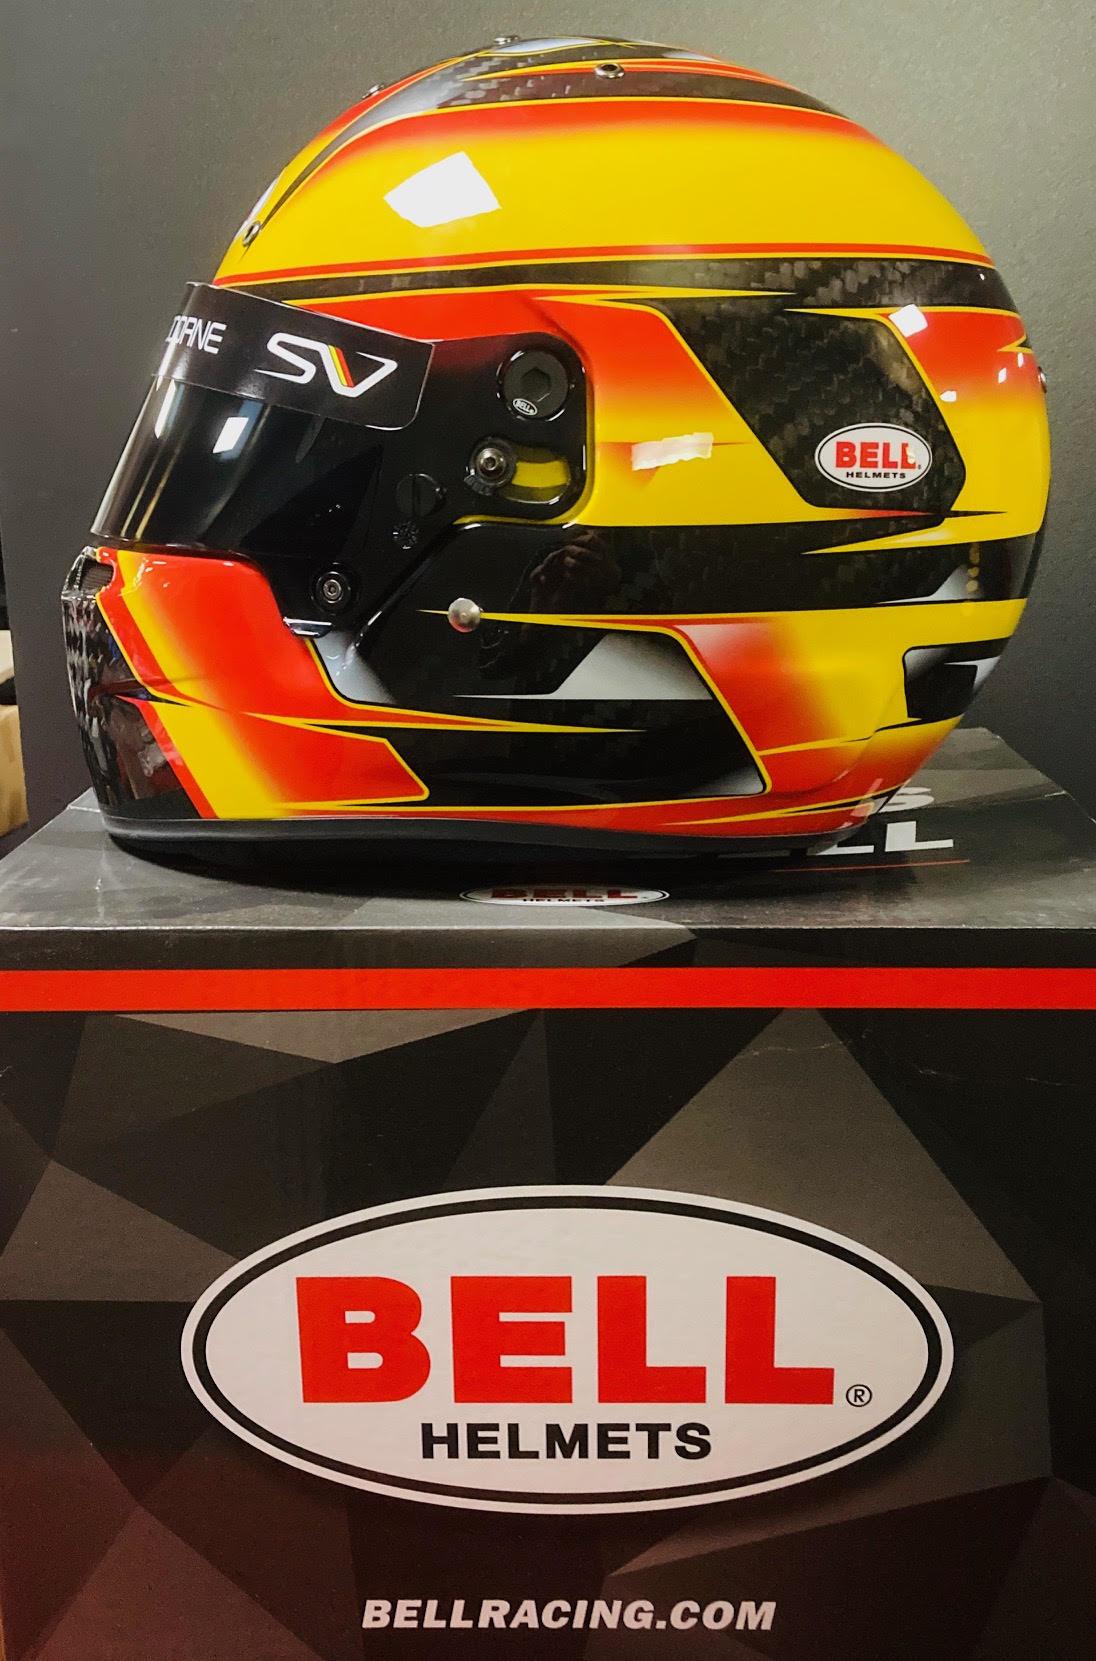 Bell Helmets F1 Replica Helme 1:1 Stoffel Vandoorne 2018